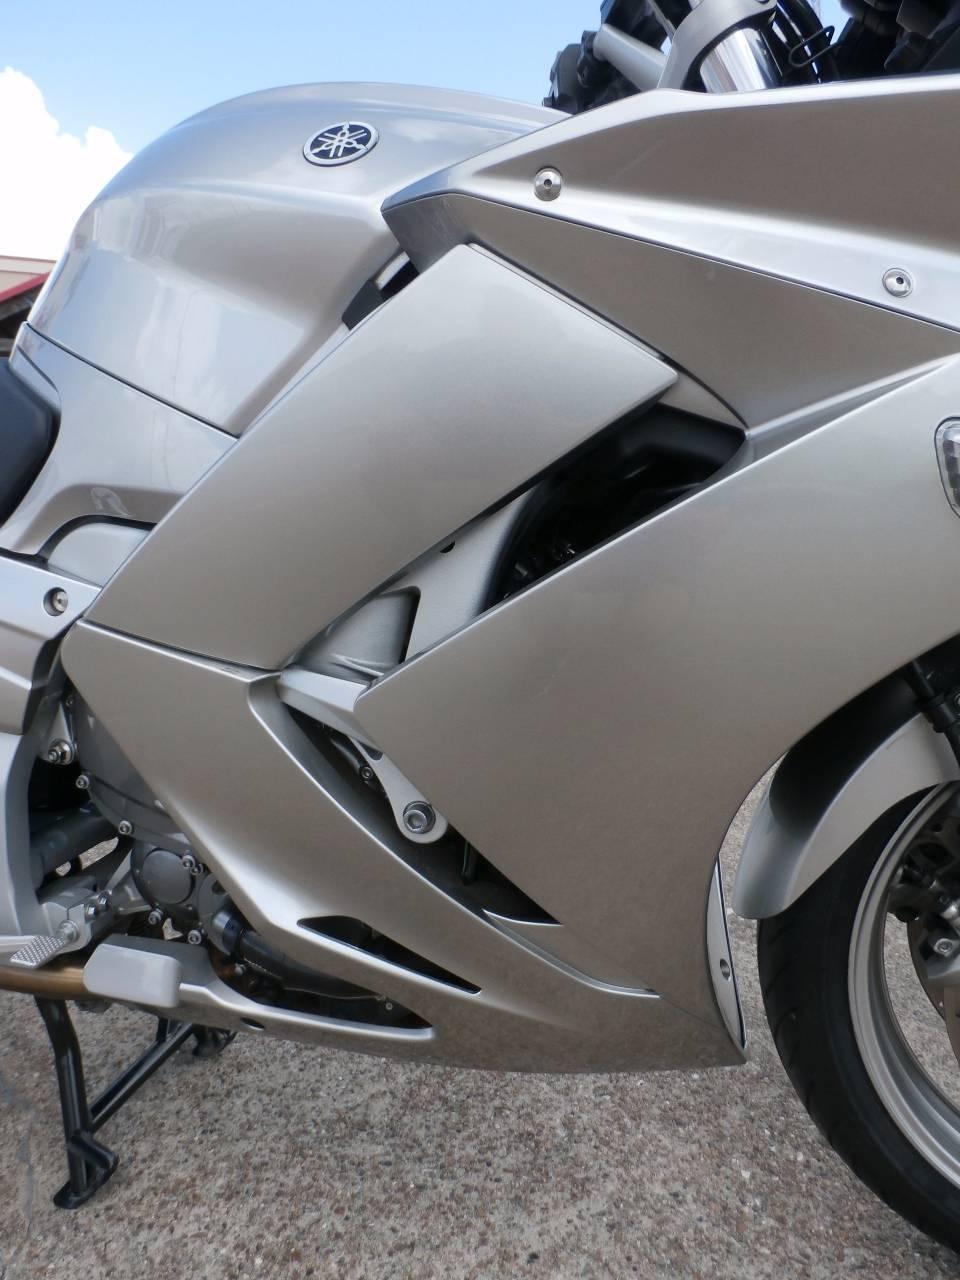 2011 Yamaha FJR1300A 6